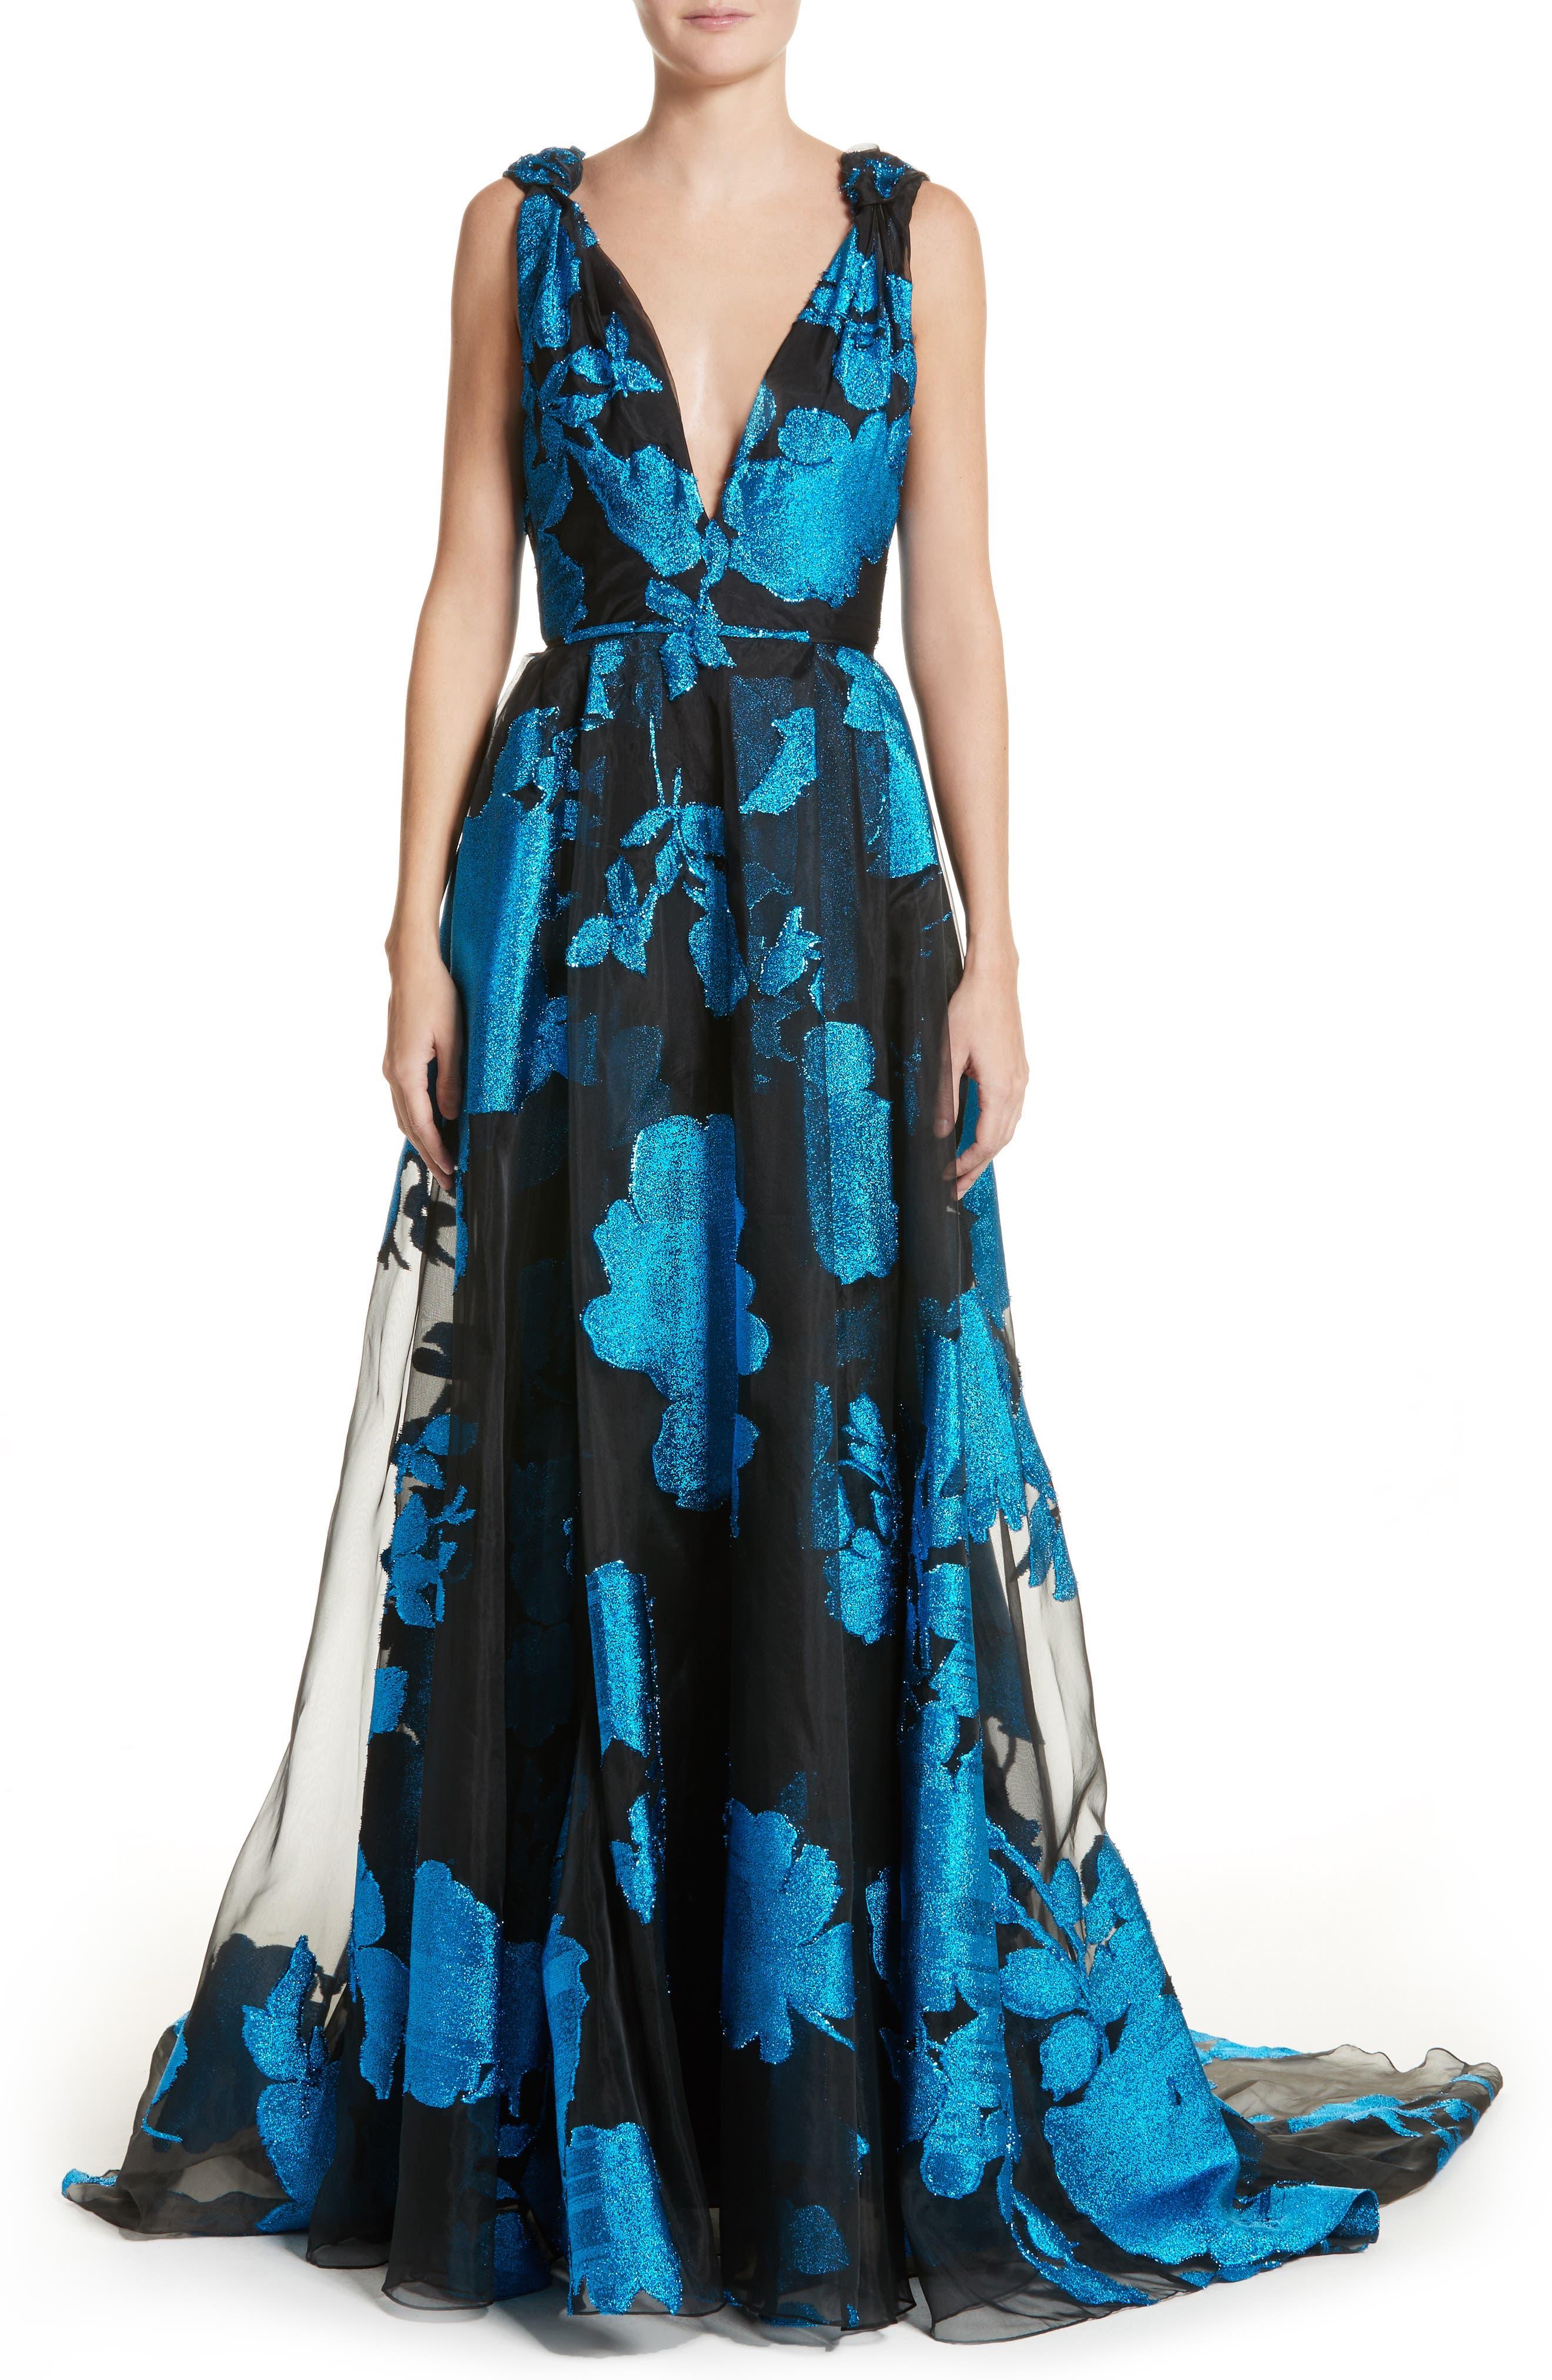 Carolina Herrera Metallic Floral Chiffon Gown